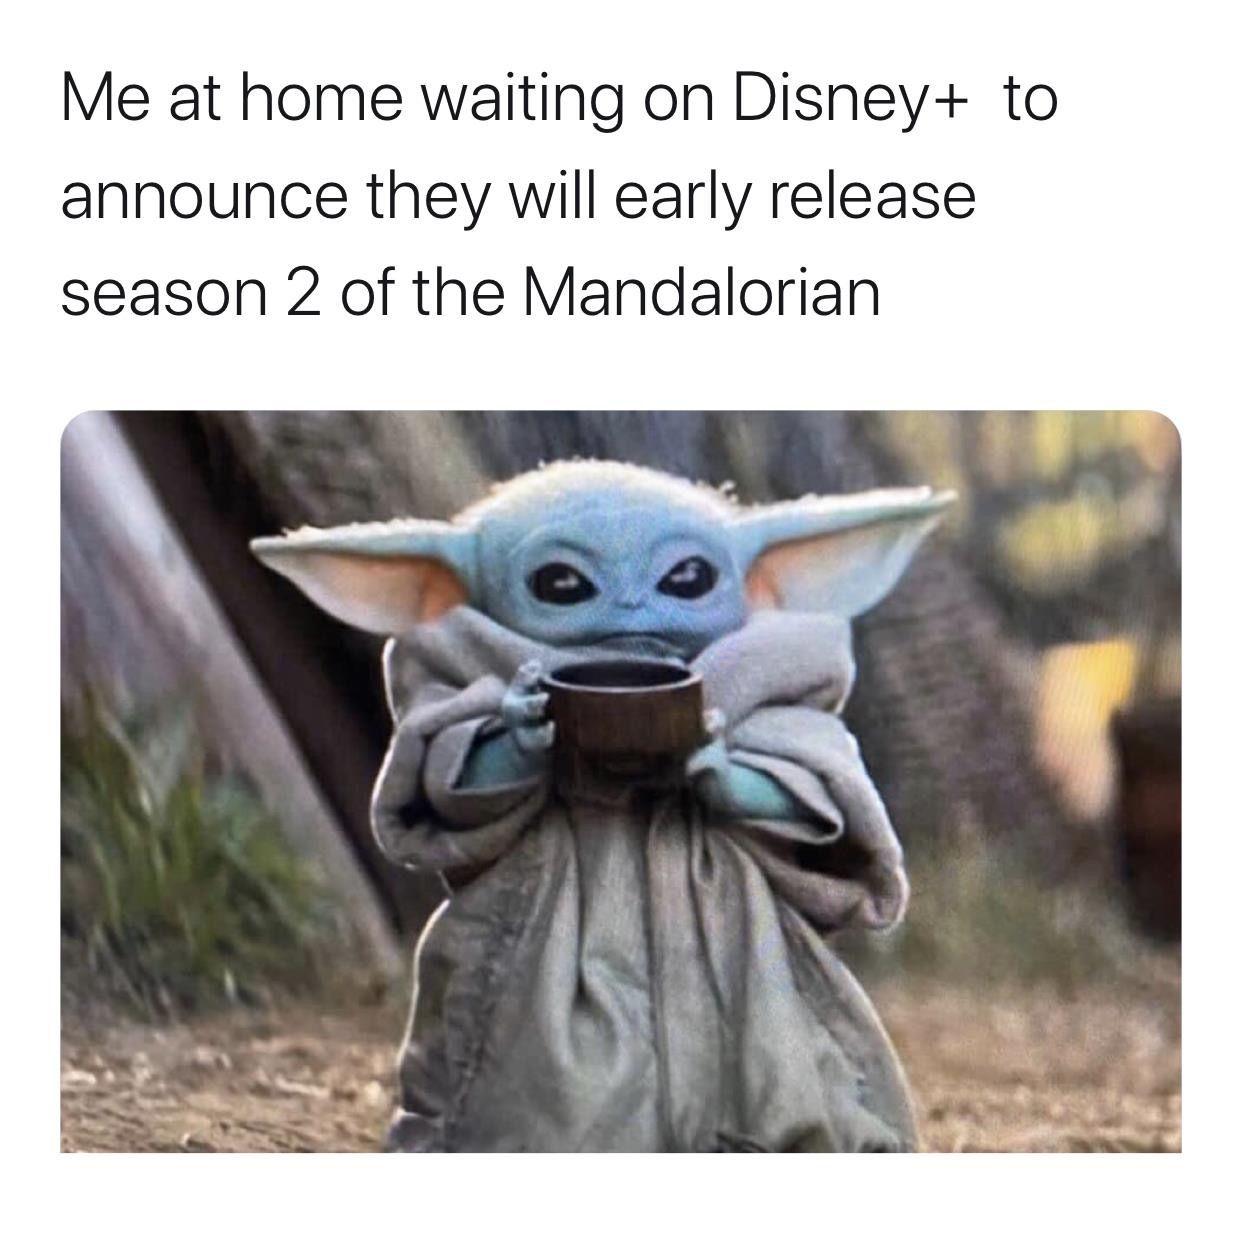 Baby Yoda Yoda Meme Funny Pictures Star Wars Memes